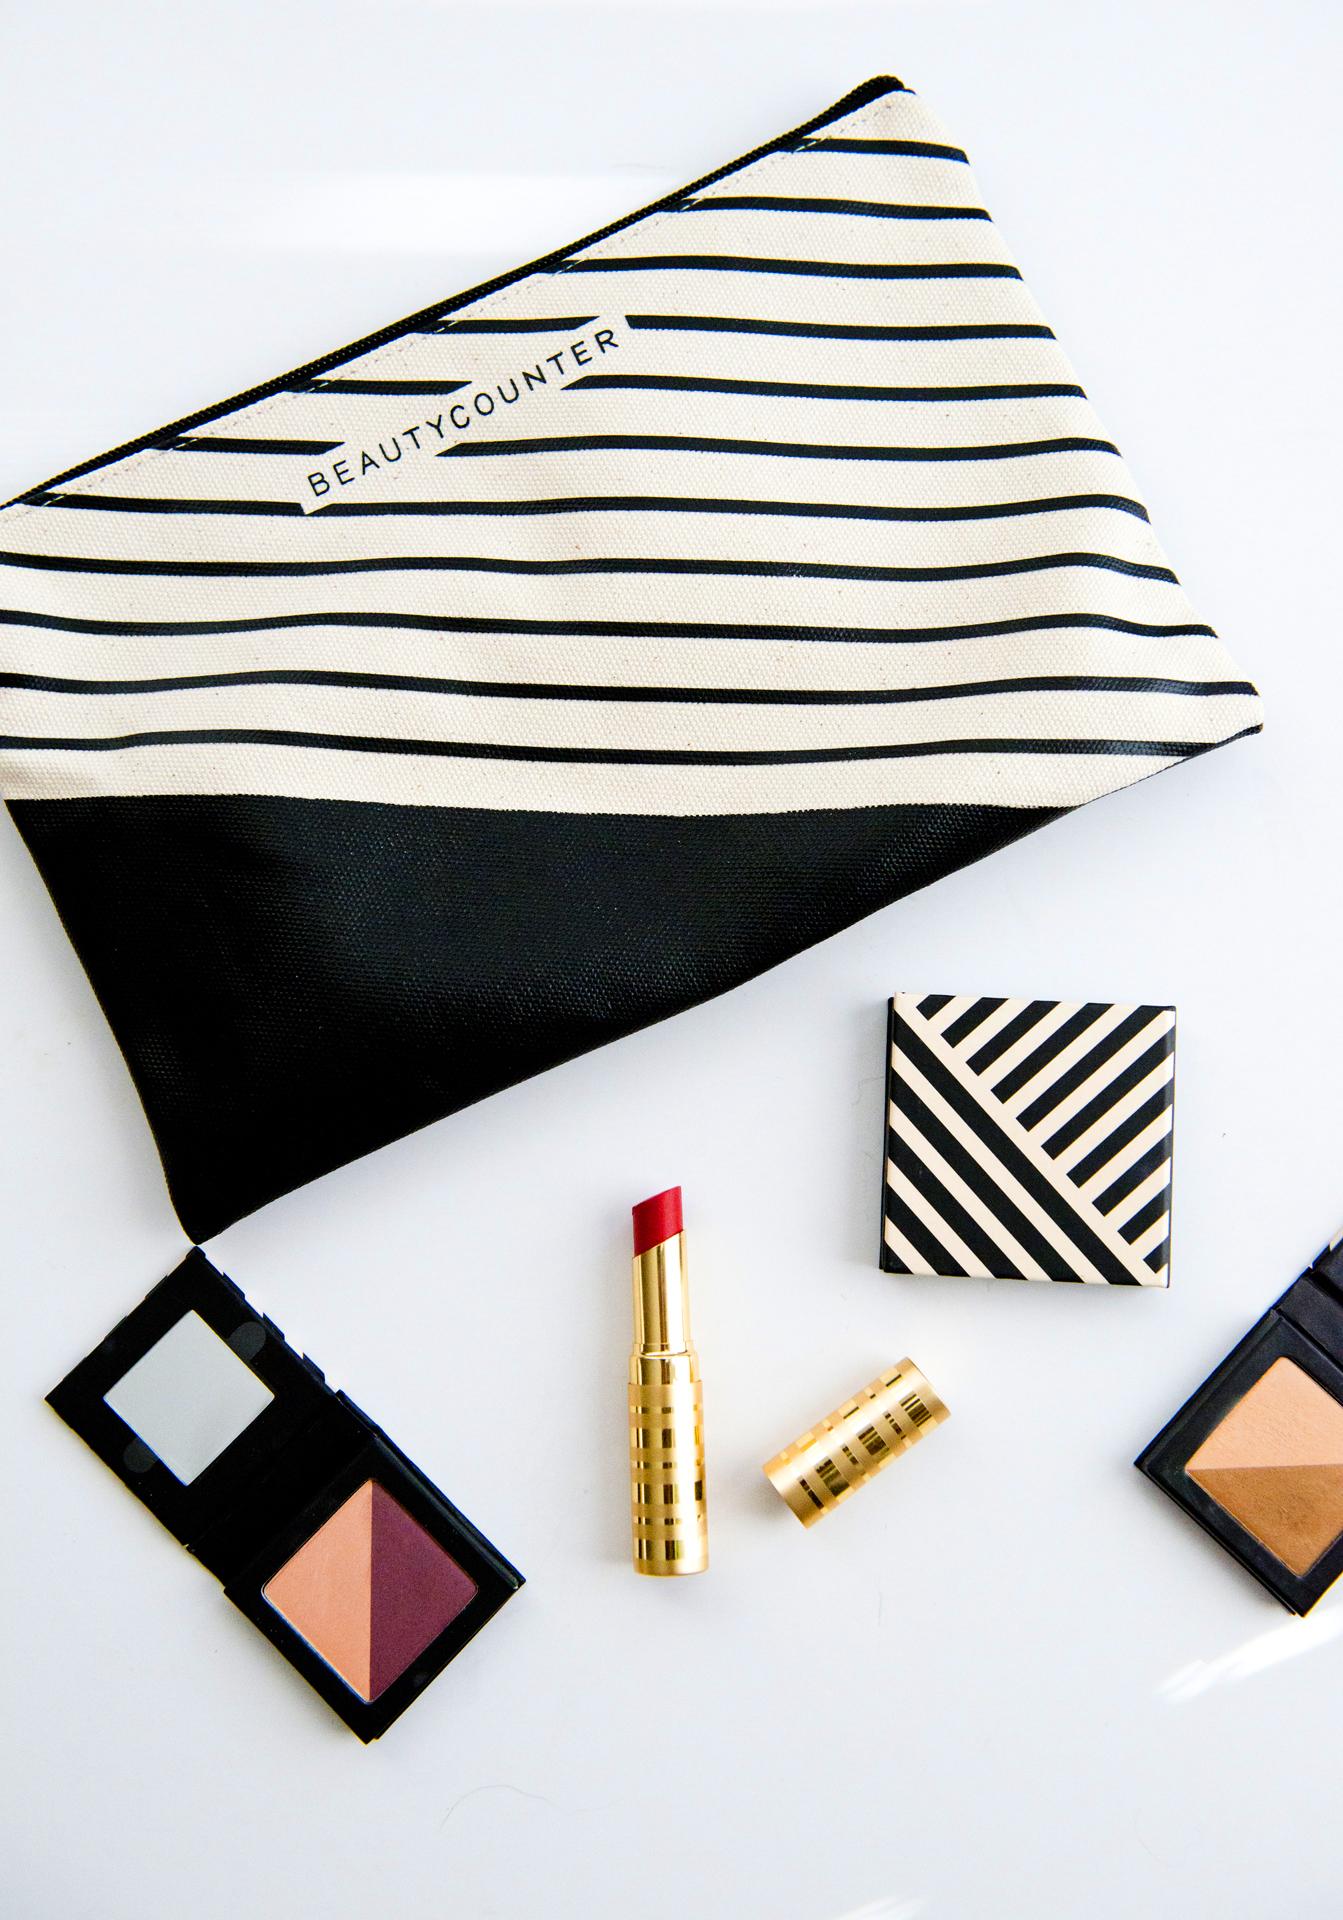 Beauty Counter's Organic Makeup